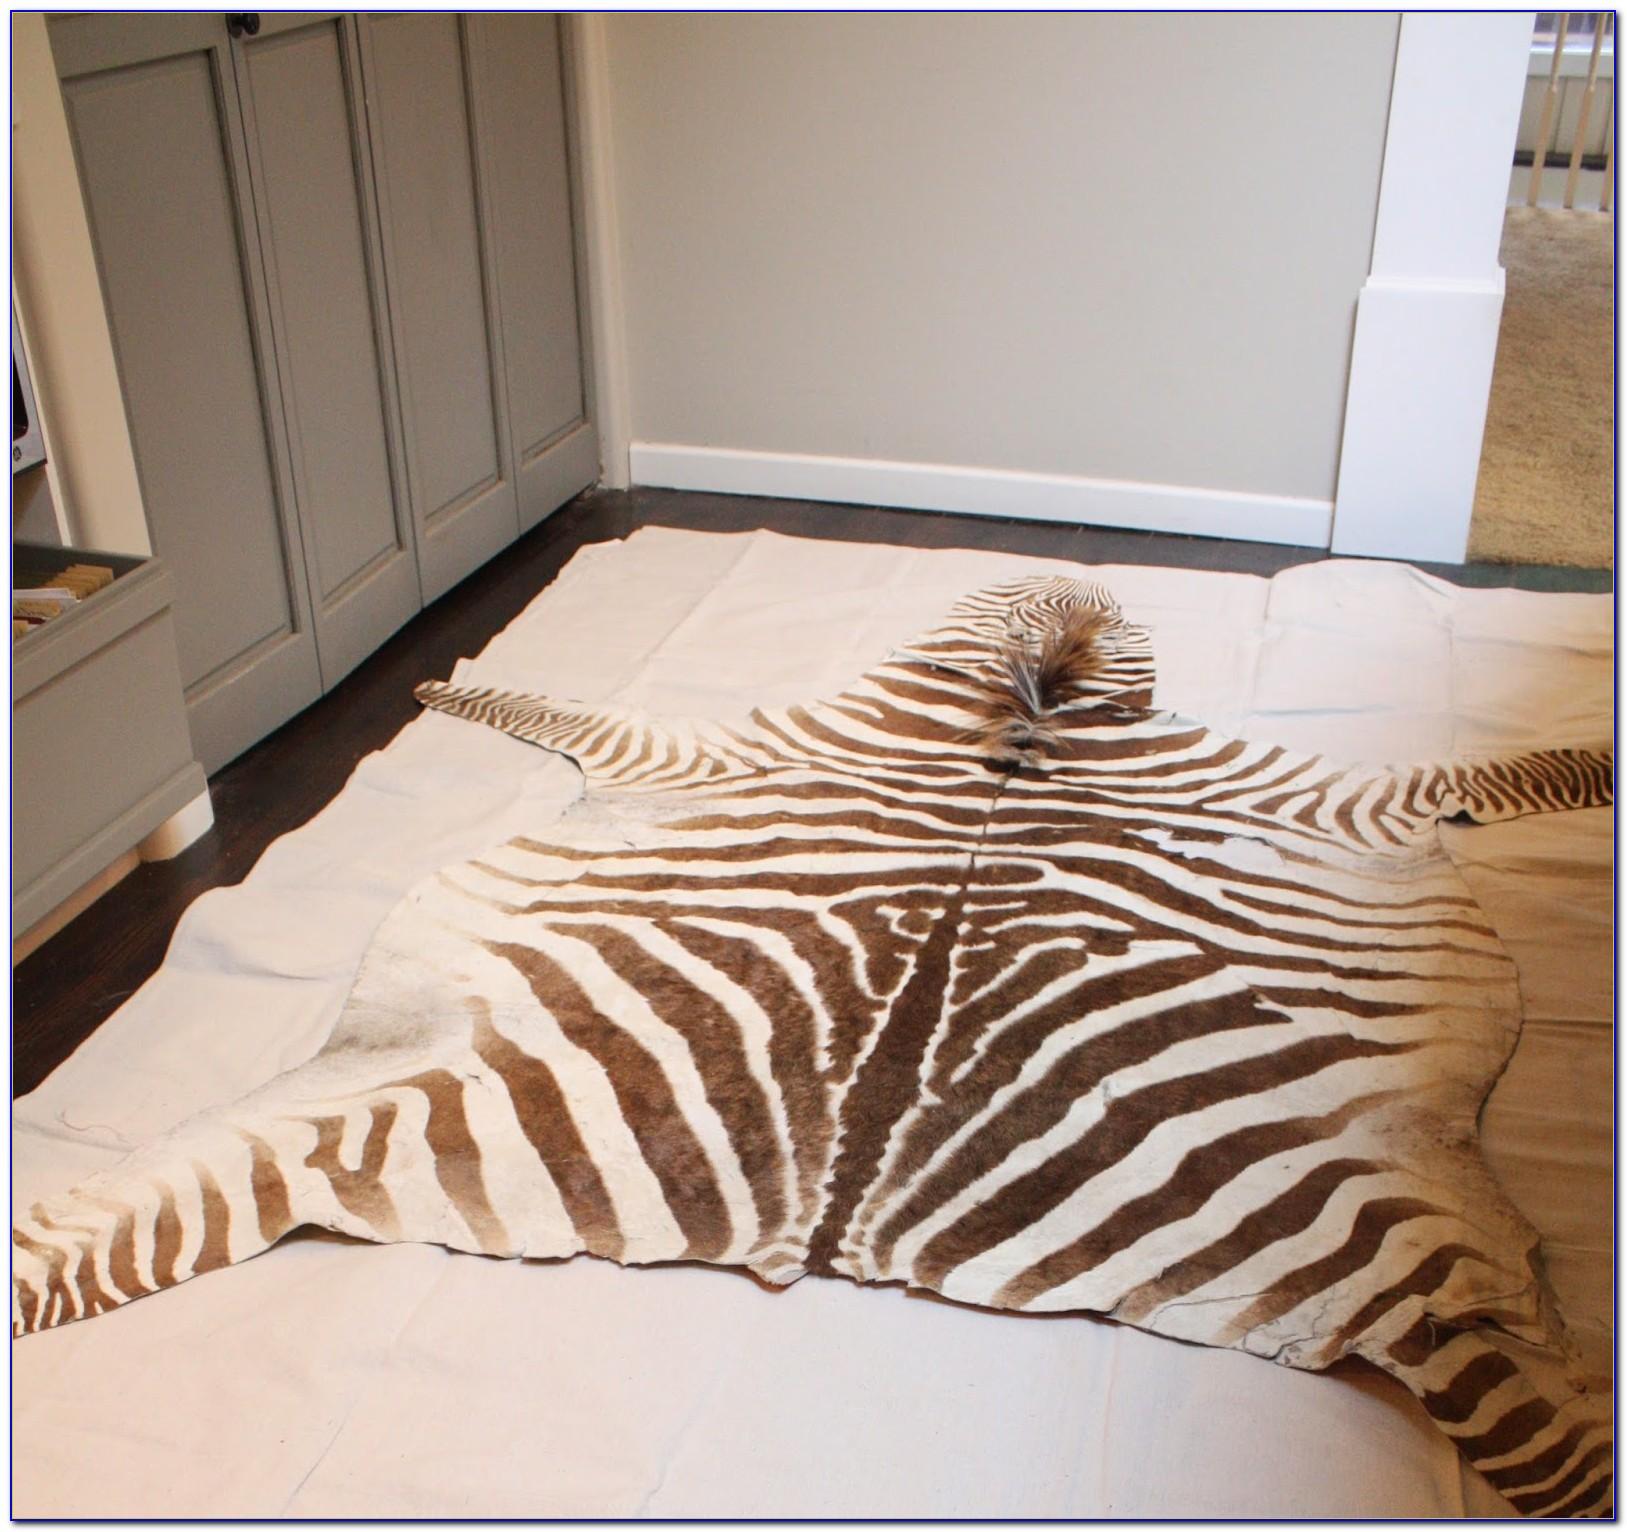 Zebra Rug Faux: Rugs : Home Design Ideas #ojn3WMLnxw60060